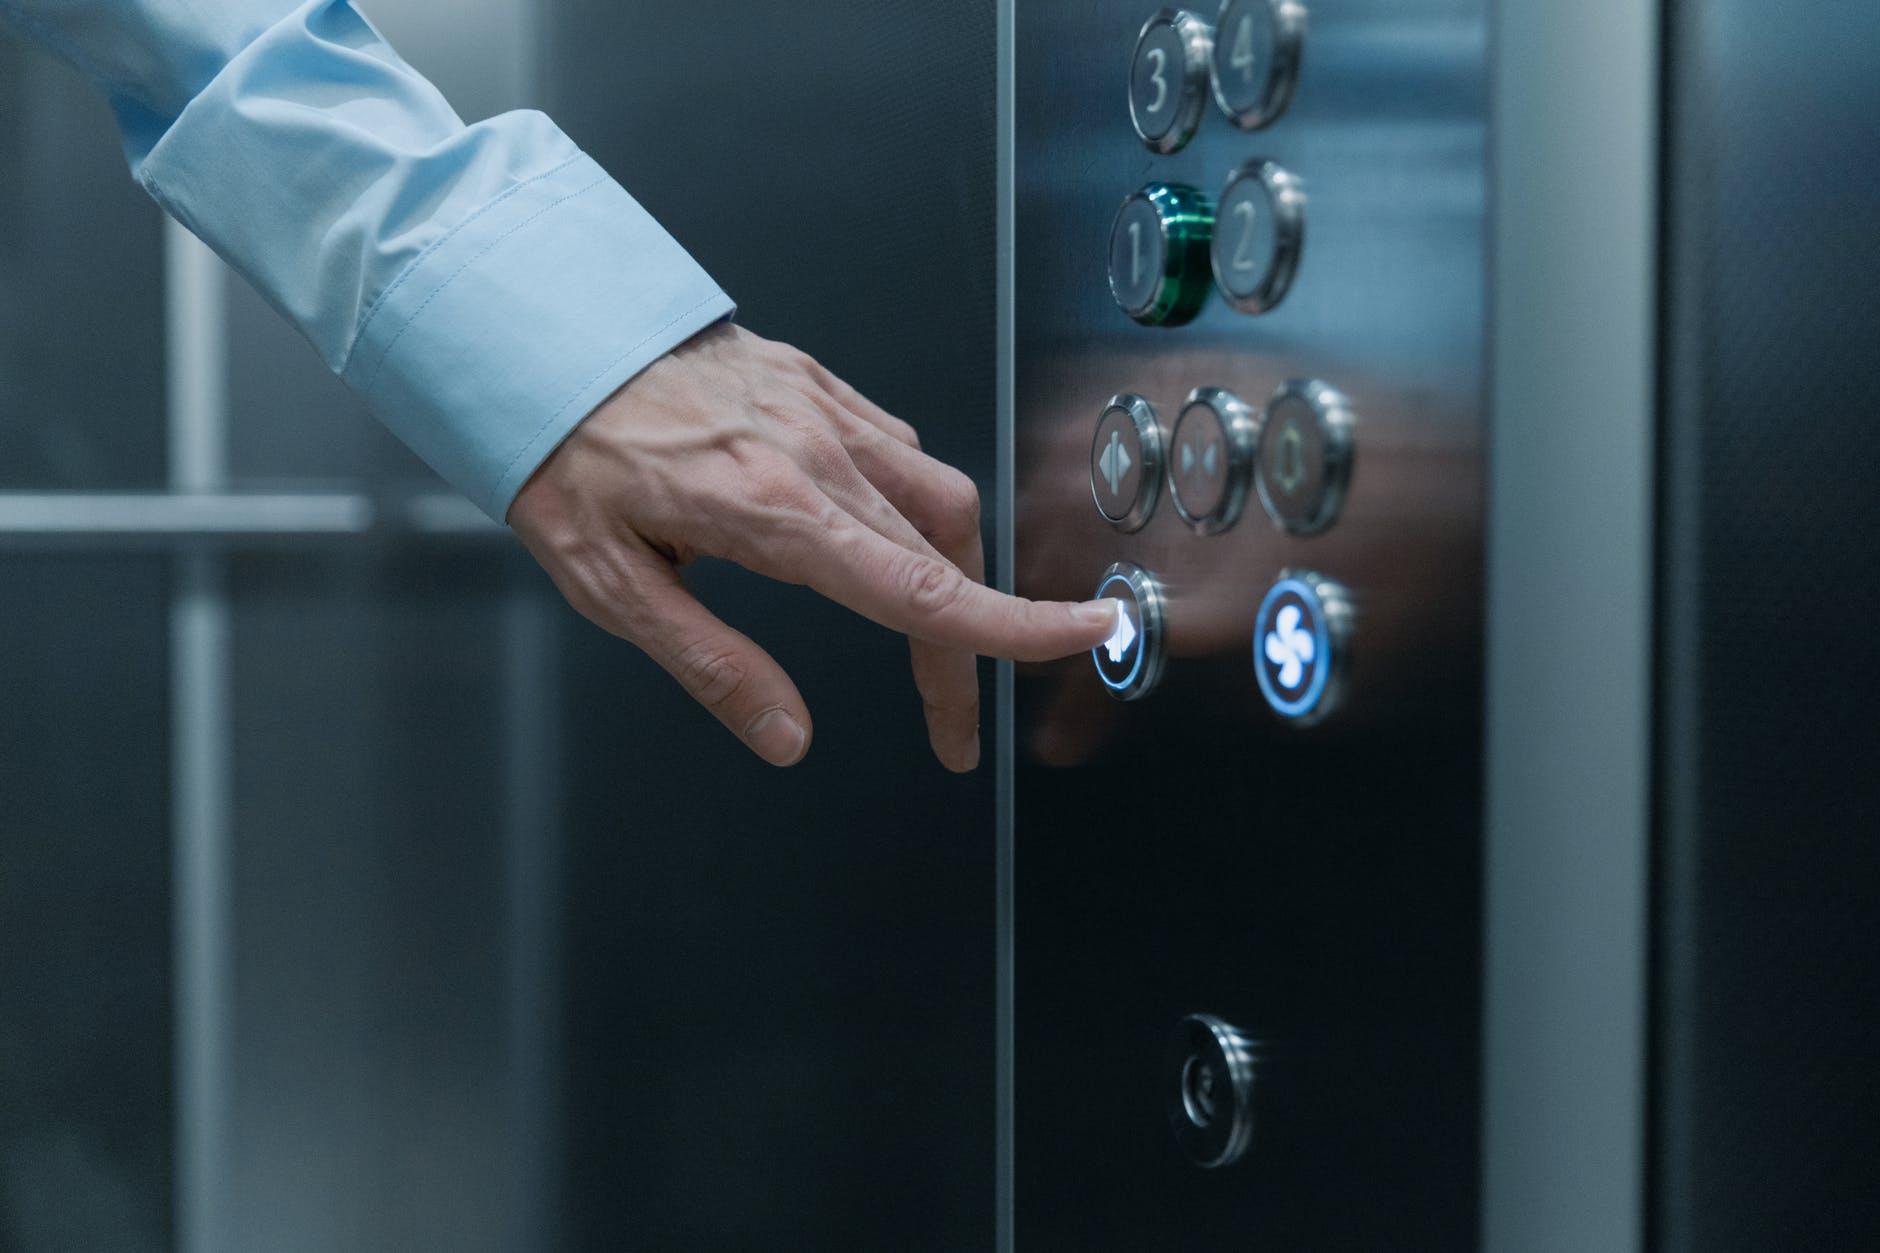 Dez curiosidades sobre elevadores